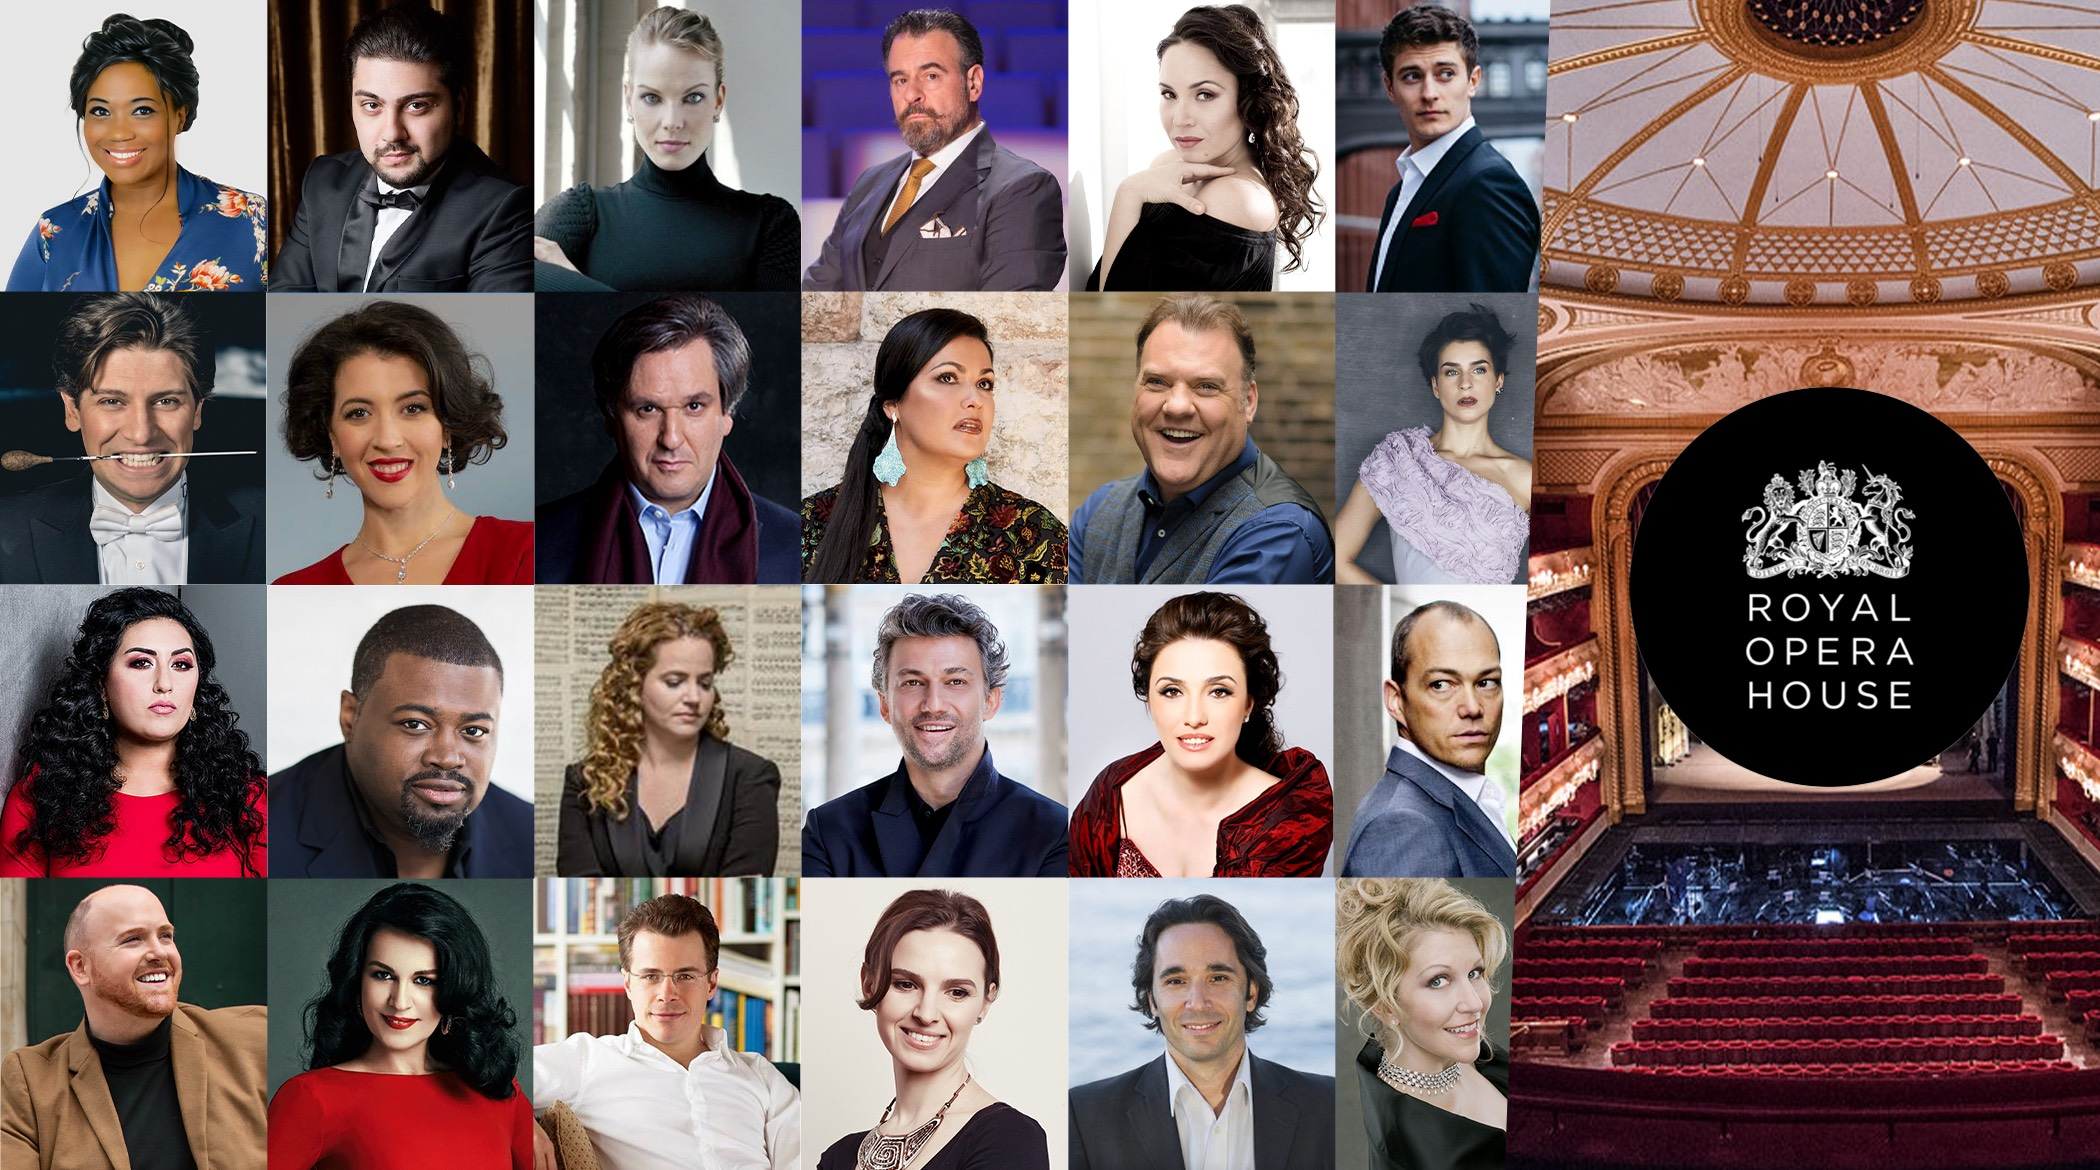 ROH2122; Royal Opera House; London; Anna Netrebko; Pappano; Kaufmann